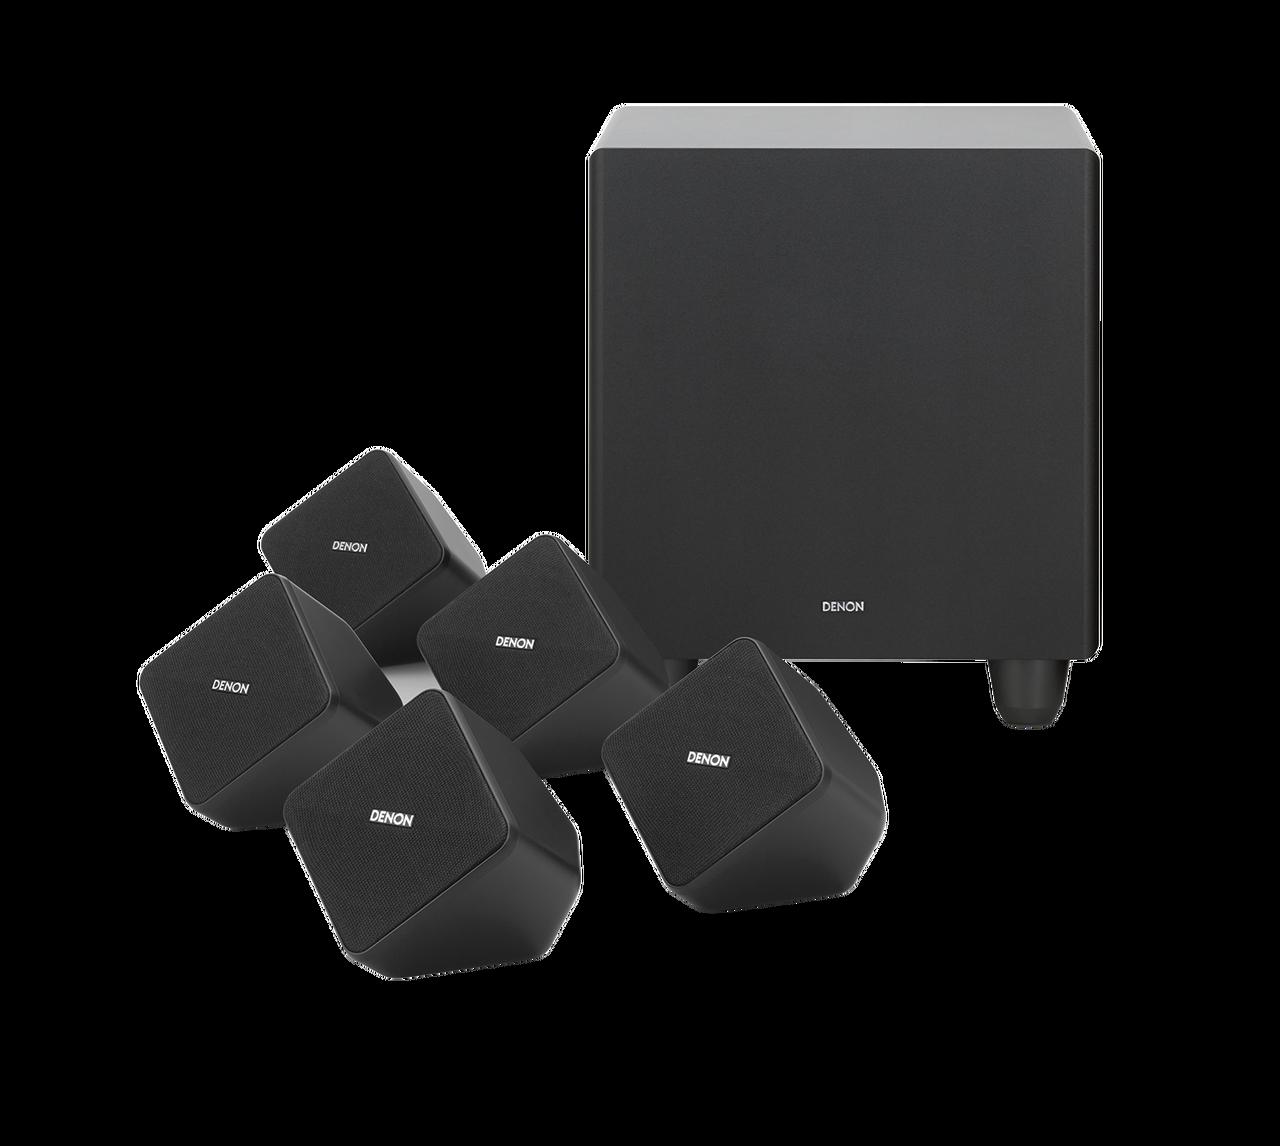 Denon SYS-2020 5 1 Home Theatre Speaker System